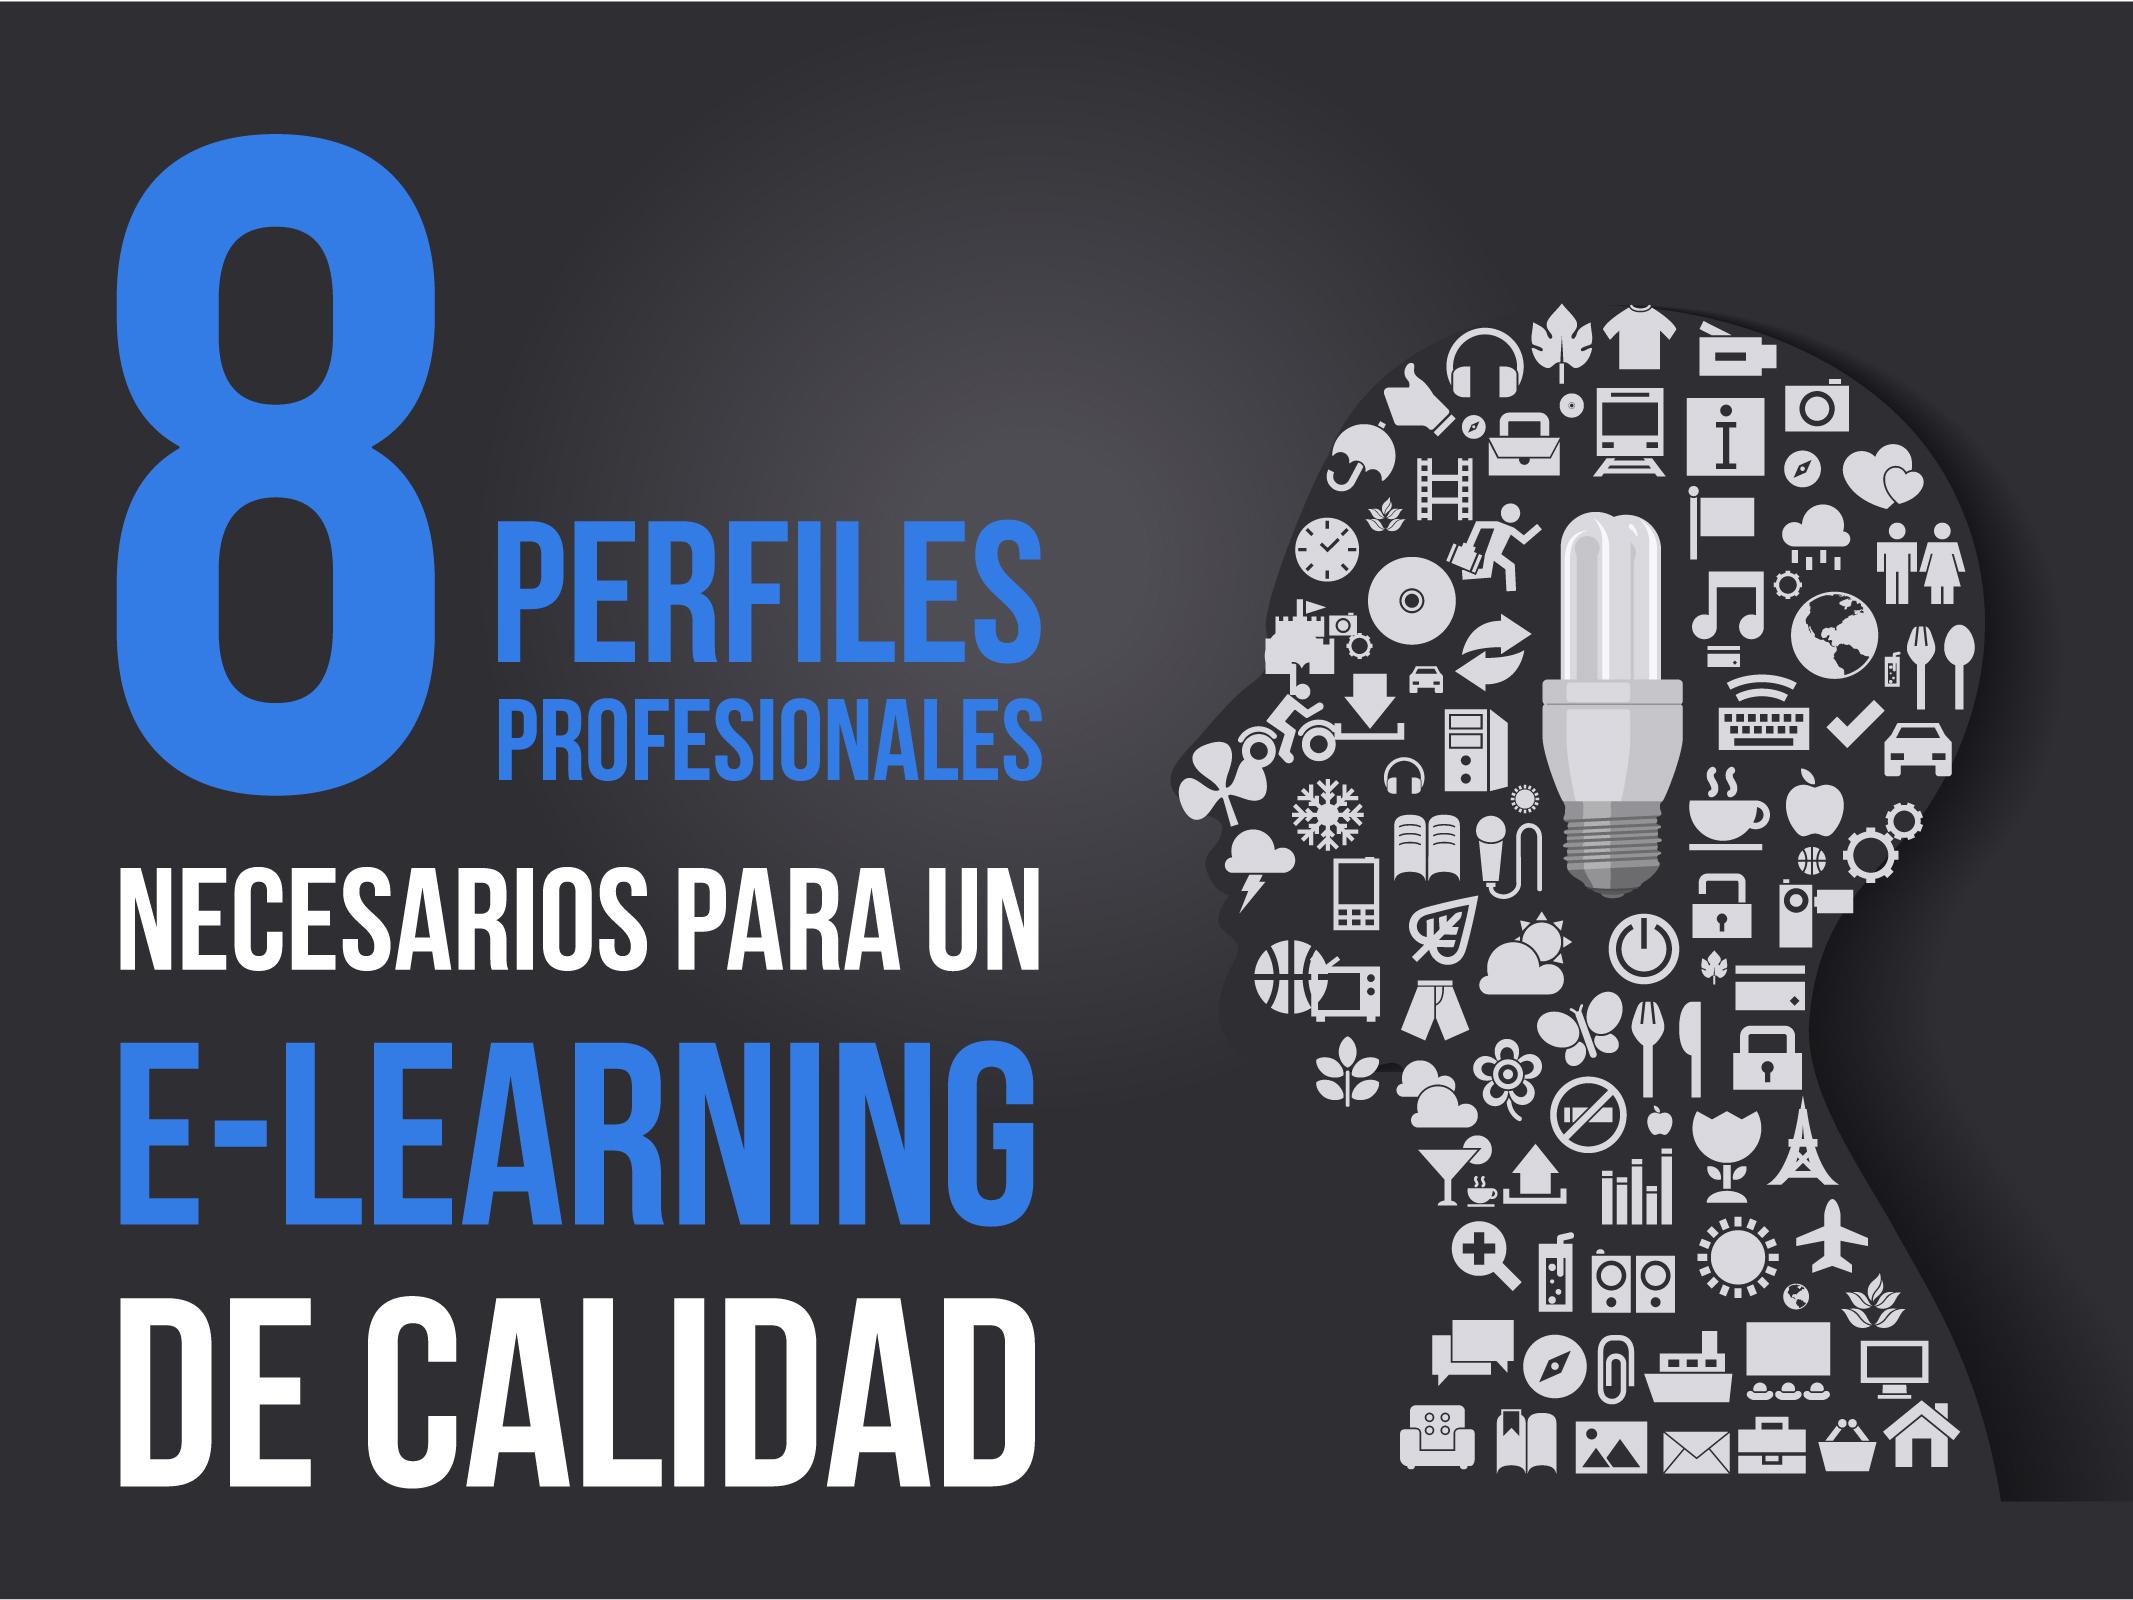 mhp-blog-8-perfiles-profesionales-necesarios-para-un-e-learning-de-calidad